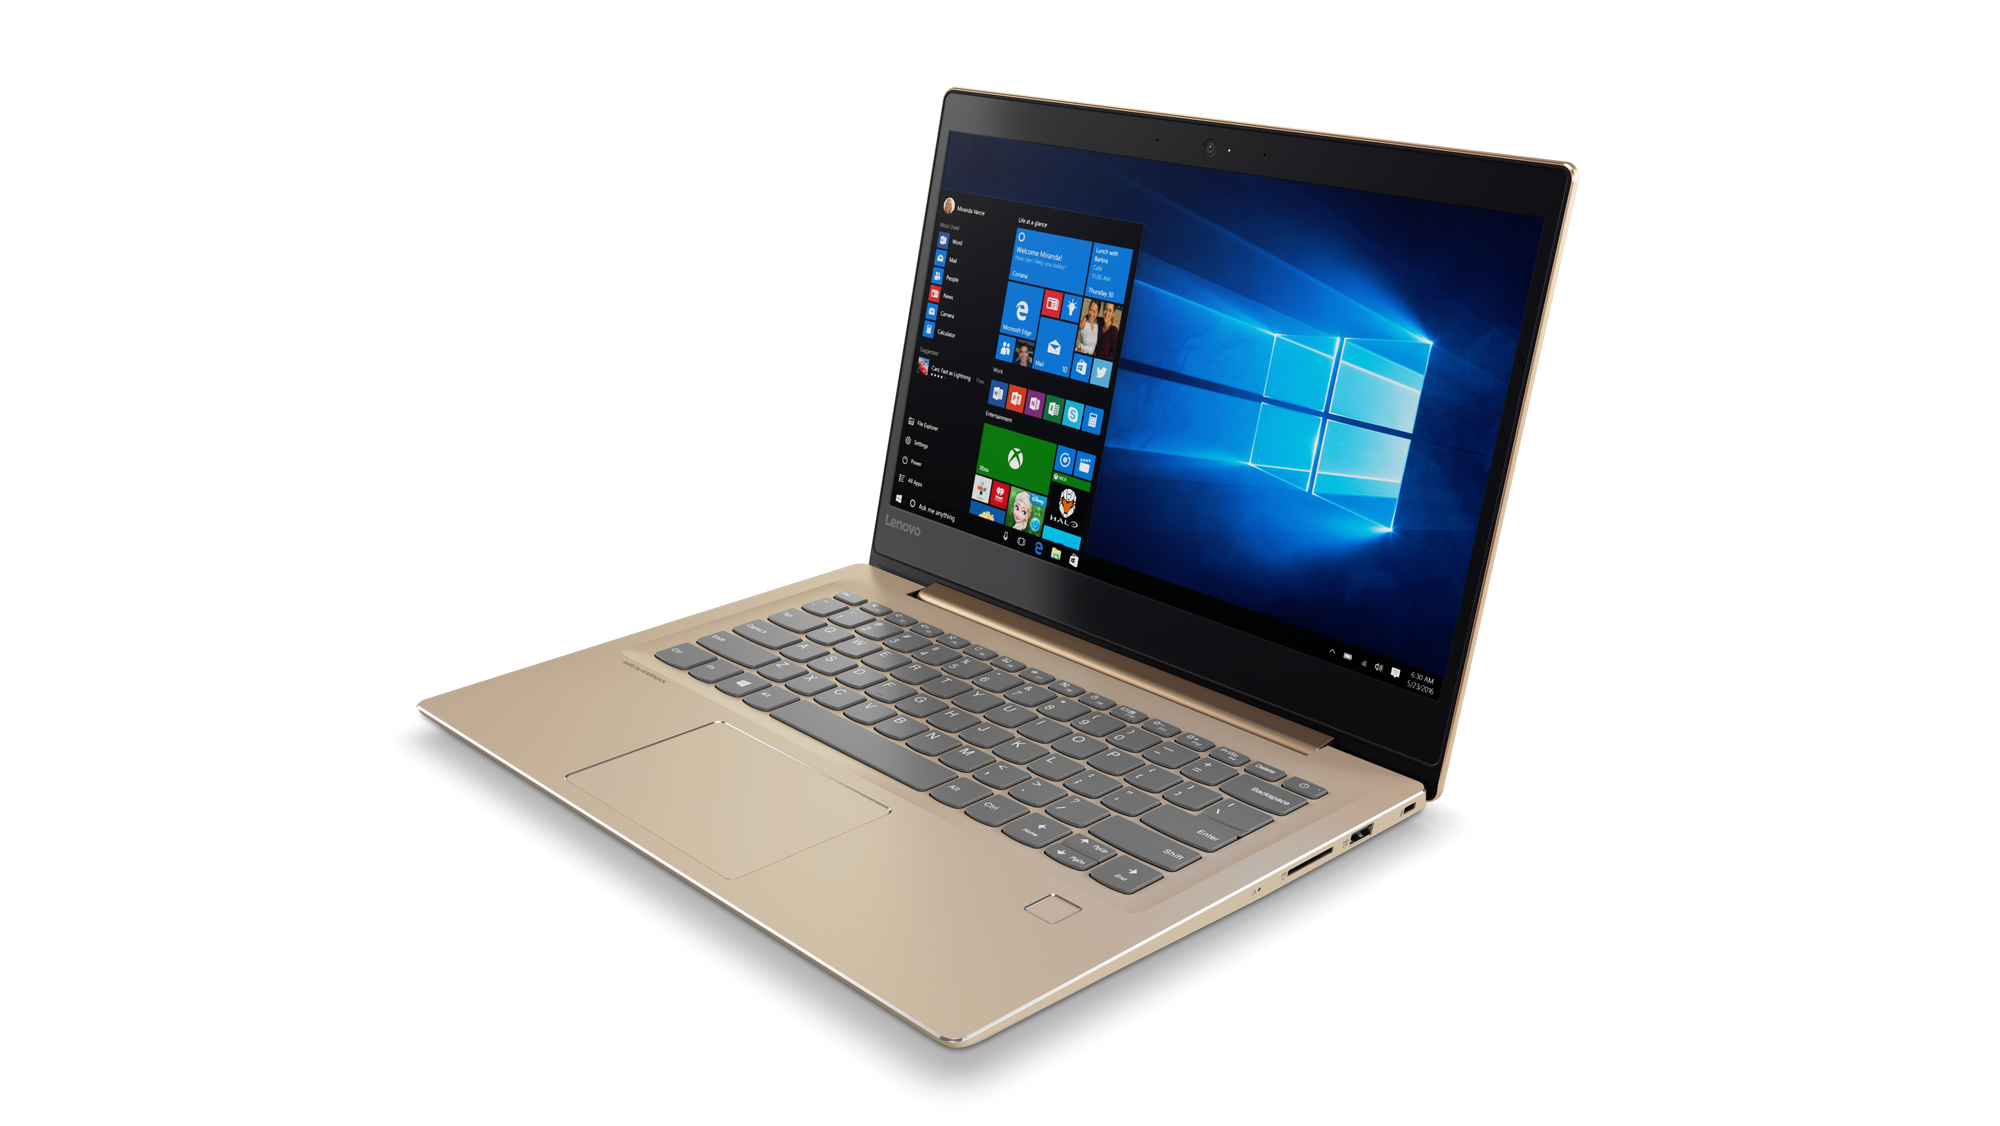 Lenovo IdeaPad 520S-14IKB 14.0 FHD IPS AG/i3-7100U/4G/128SSD/INT/W10H/Backlit/720p/Zlatá